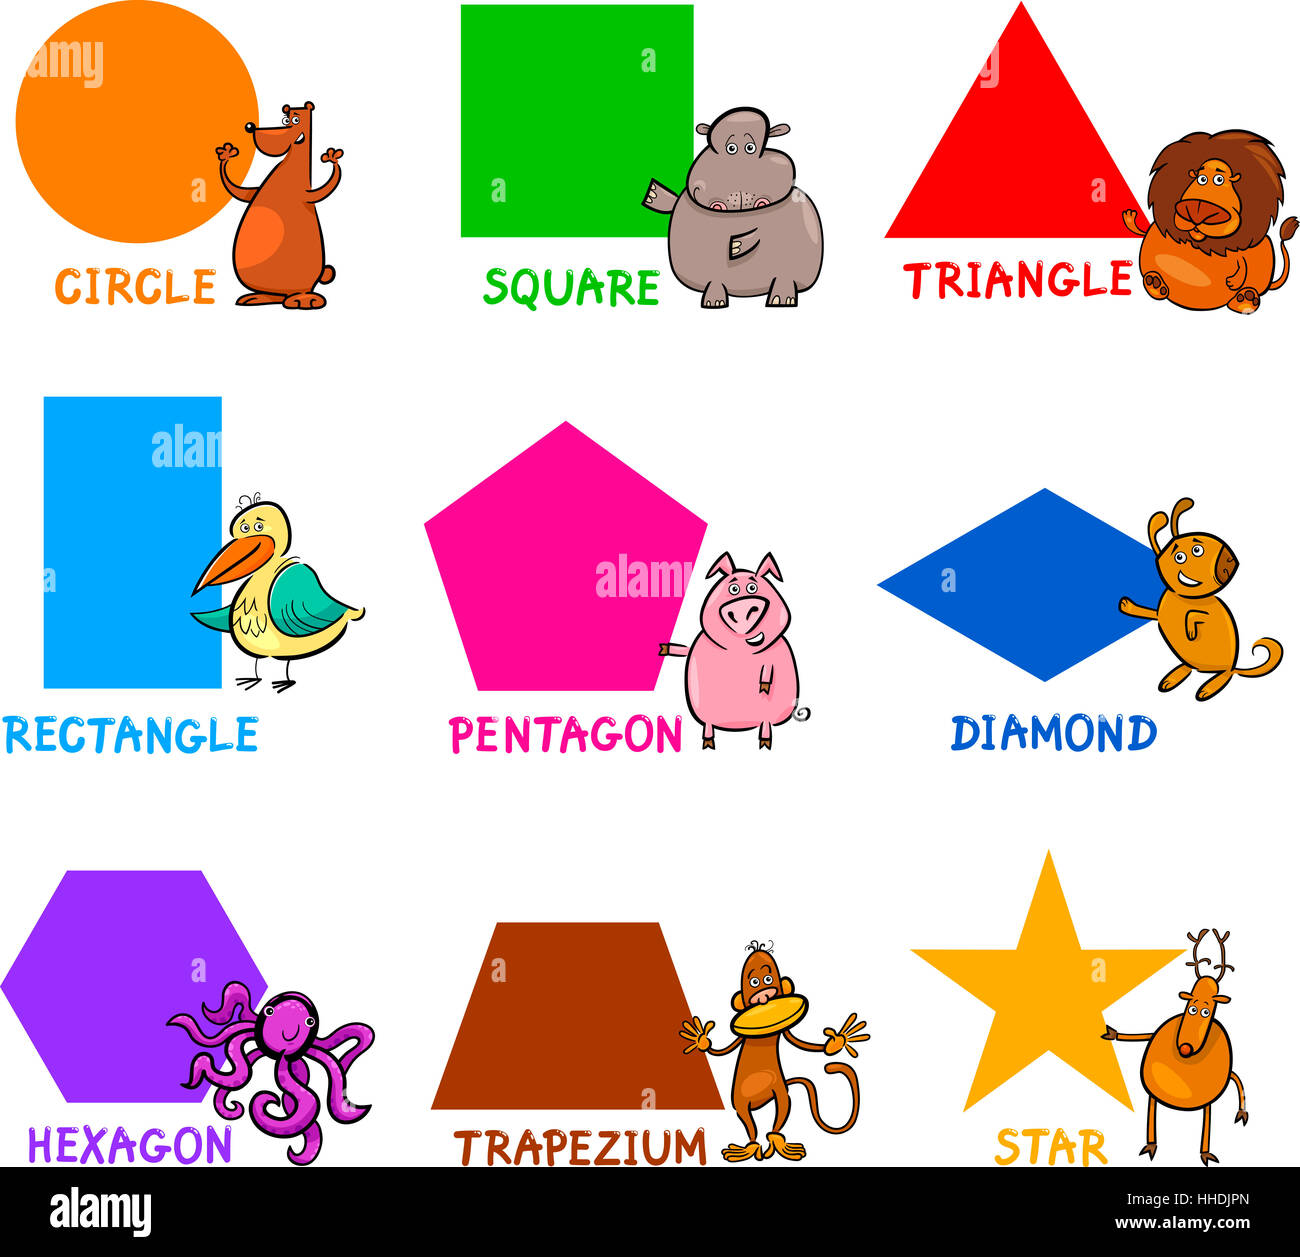 Basic Square Circle Triangle Diamond Imagenes De Stock